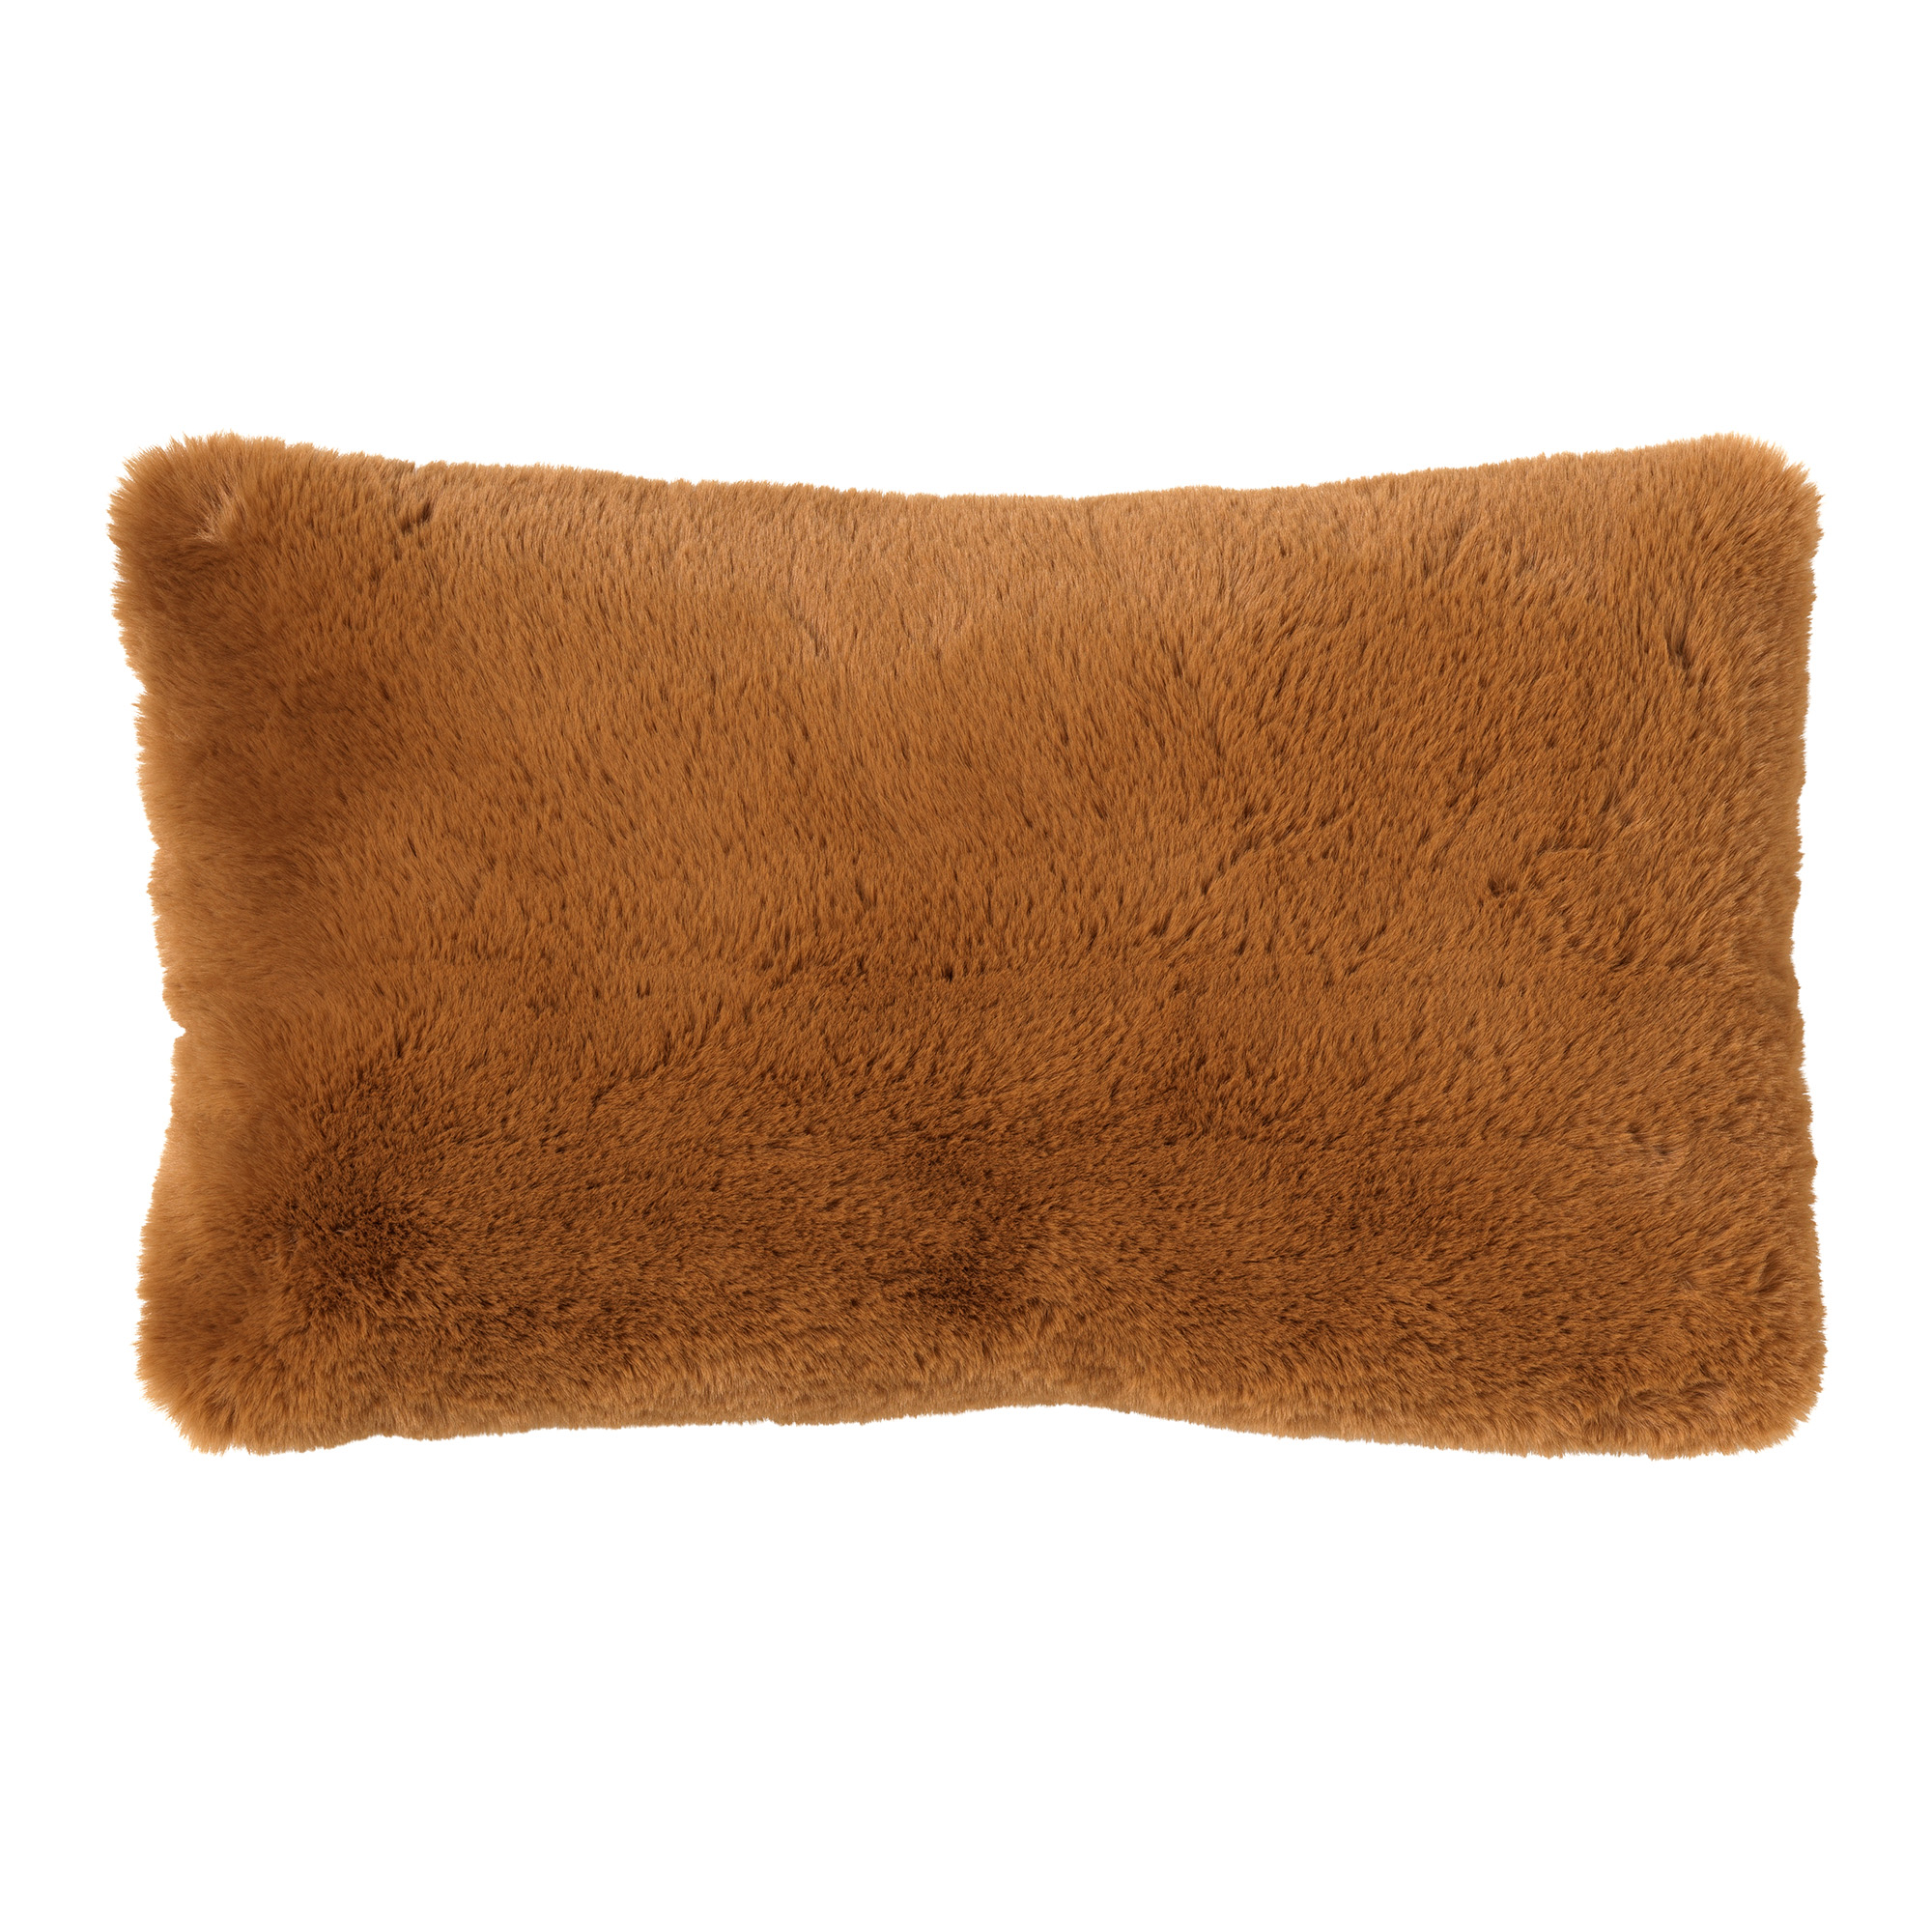 ZAYA - Kussenhoes unikleur 30x50 cm Tobacco Brown